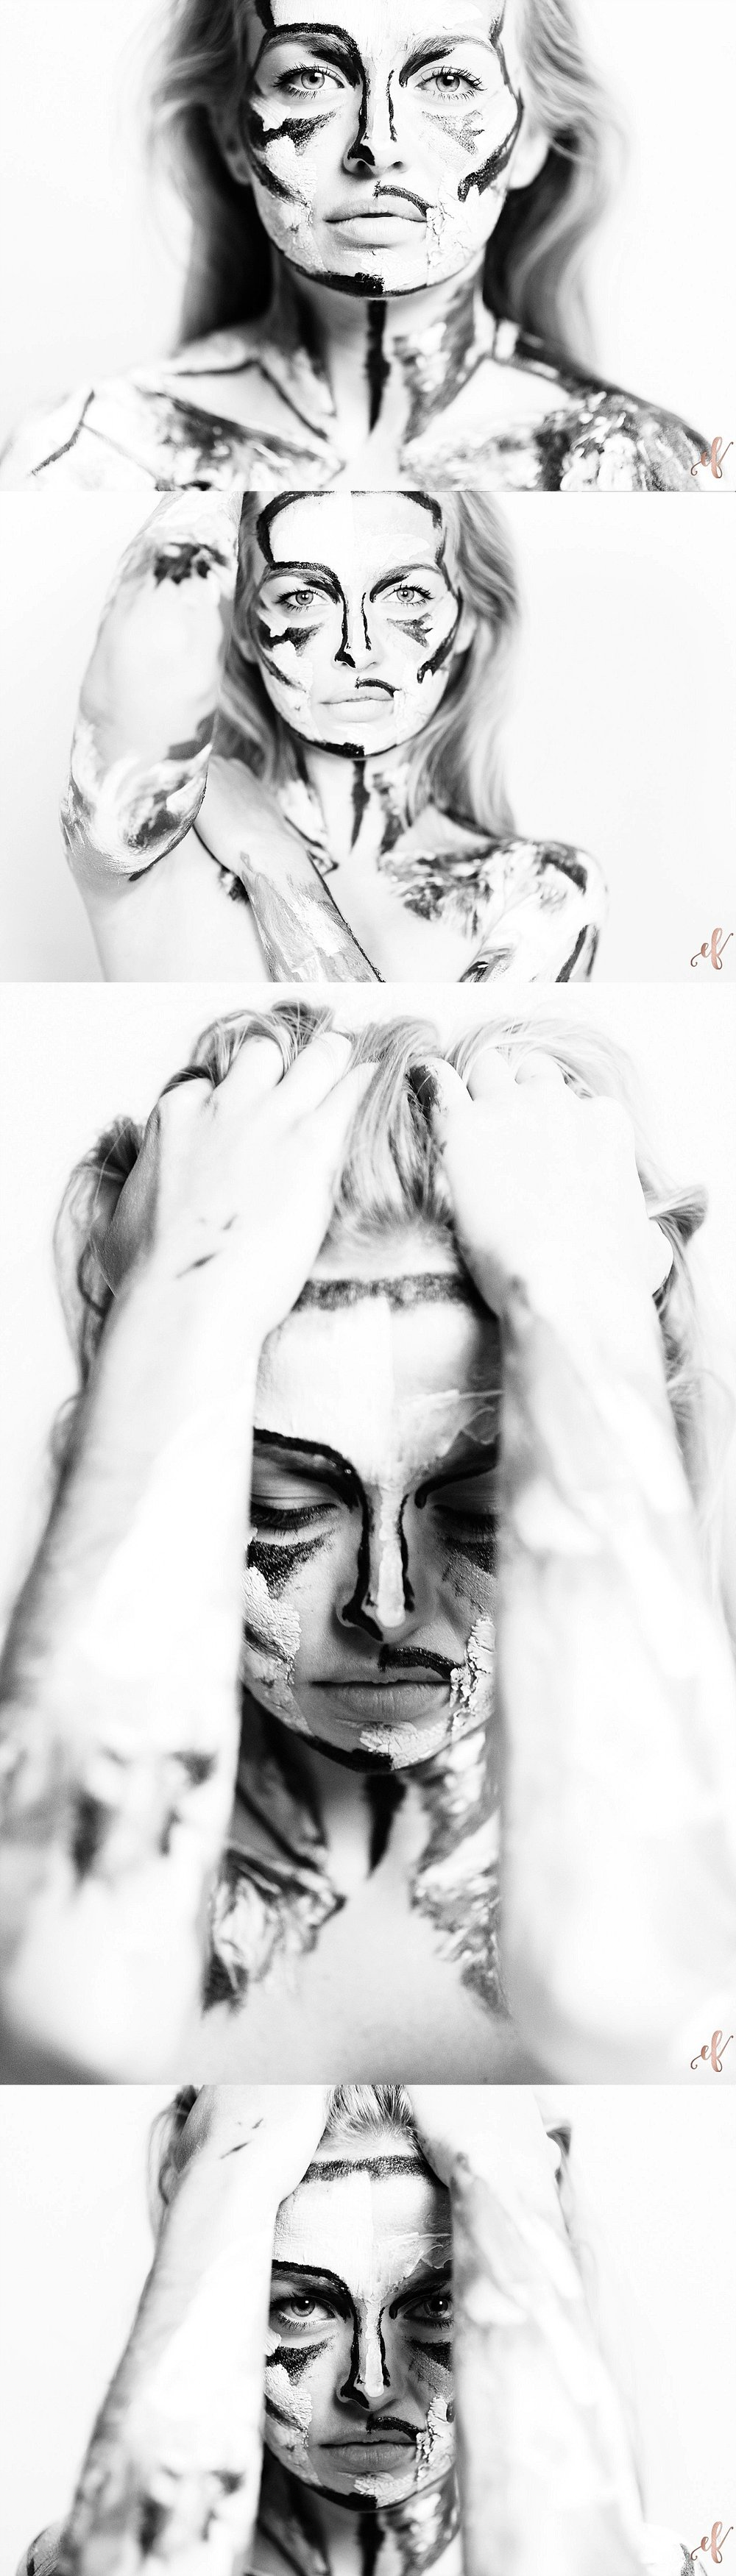 Paint Portraits | Human Canvas | Ernie & Fiona Photography